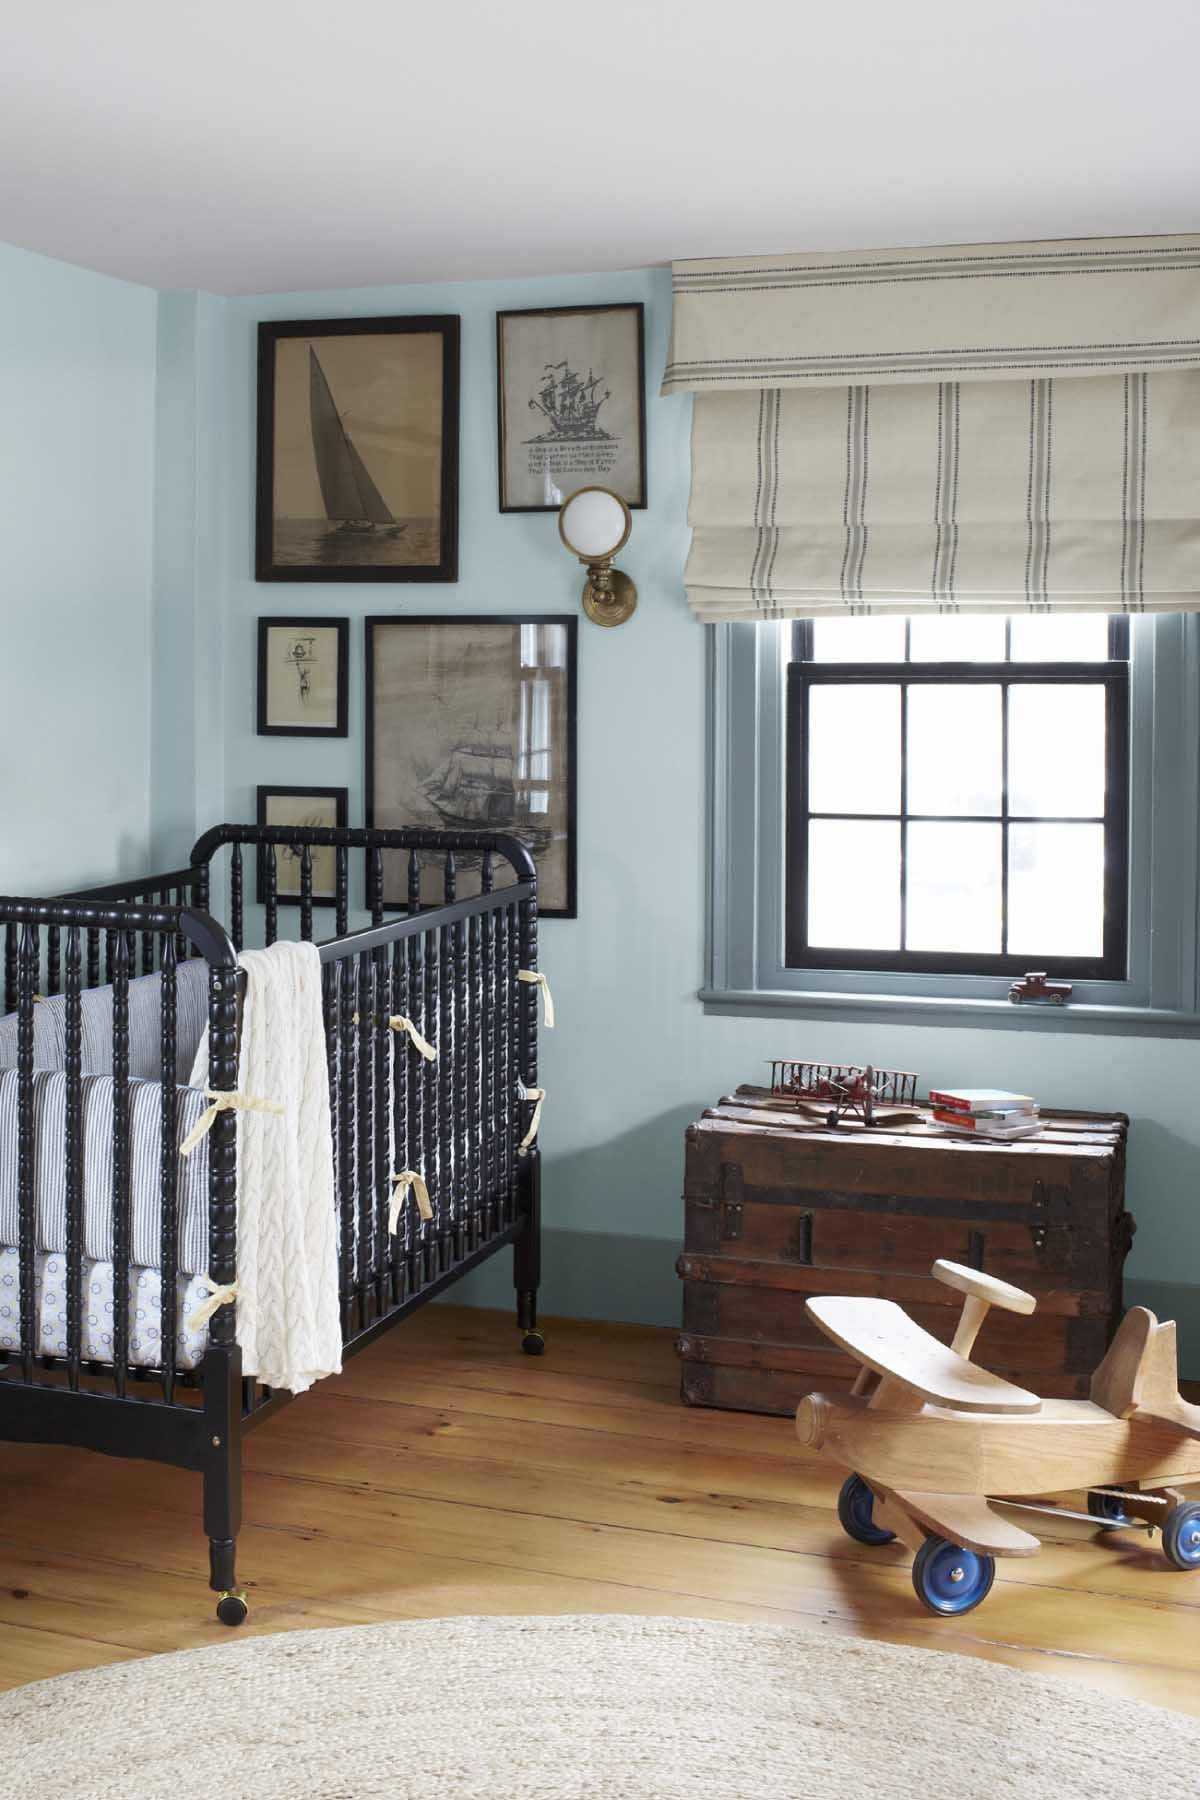 boys bedroom ideas & 14 Best Boys Bedroom Ideas - Room Decor and Themes for a Little or ...